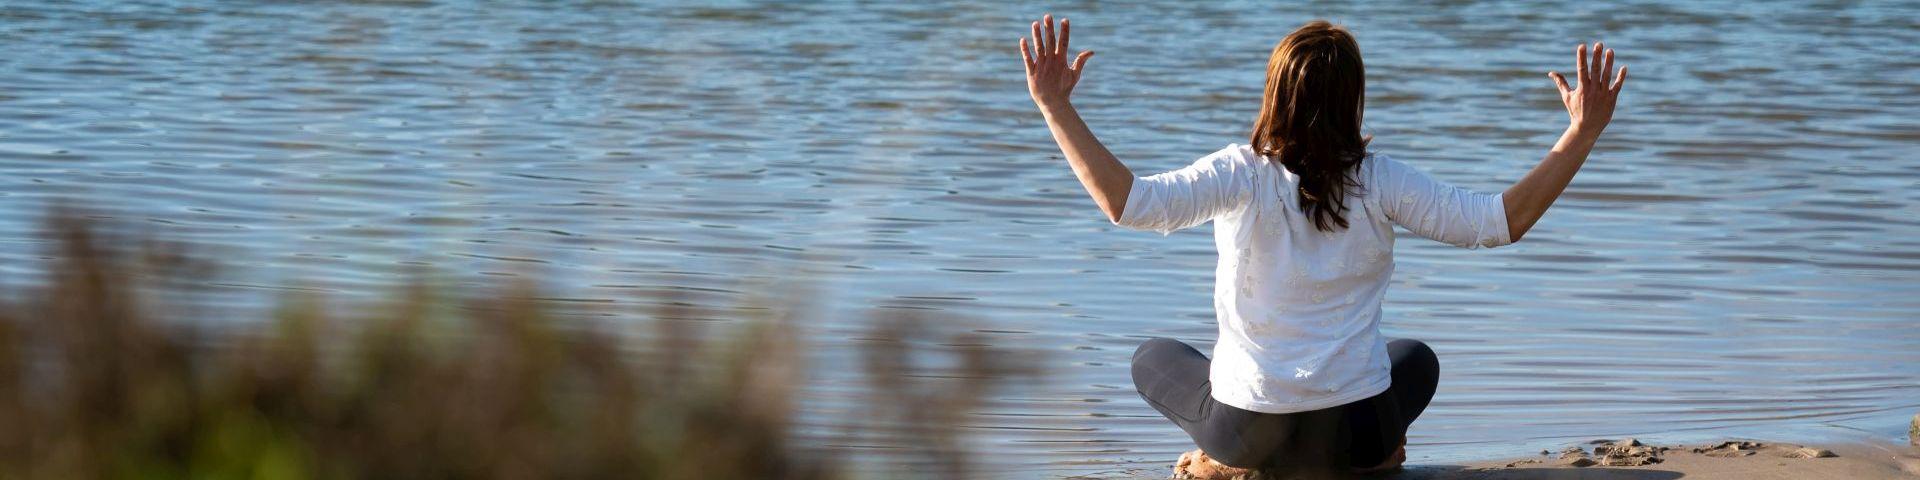 Bedrijven - Banner_Leefstijlcoach-Wageningen-Ede-Bennekom-yoga-coaching-personal-training_DSC_1463